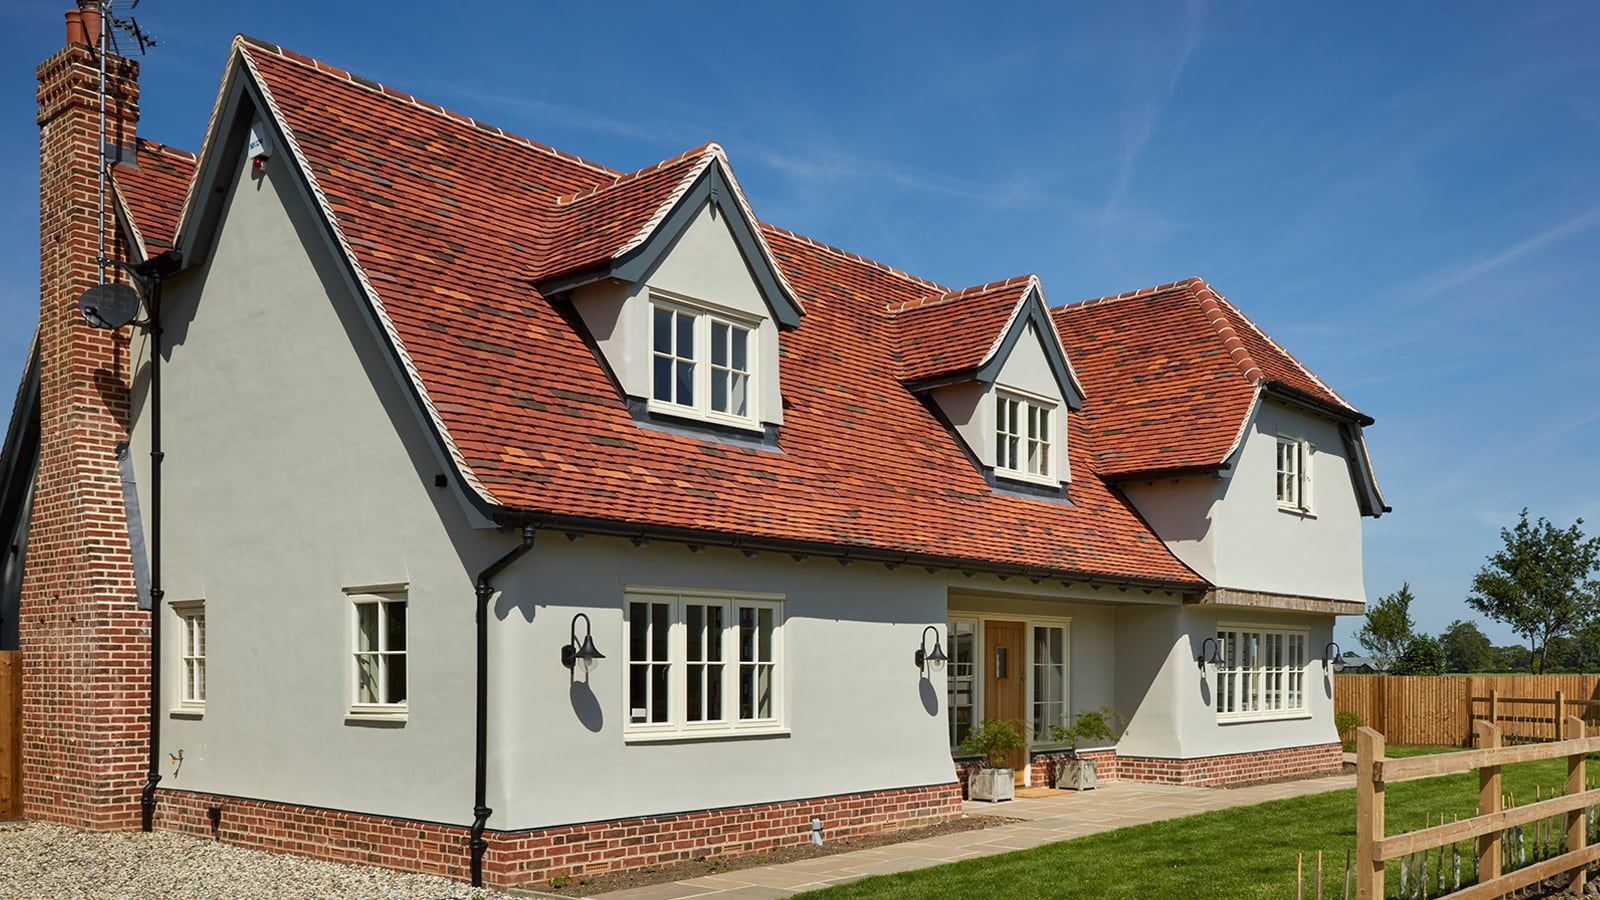 New build with Westbury windows and doors